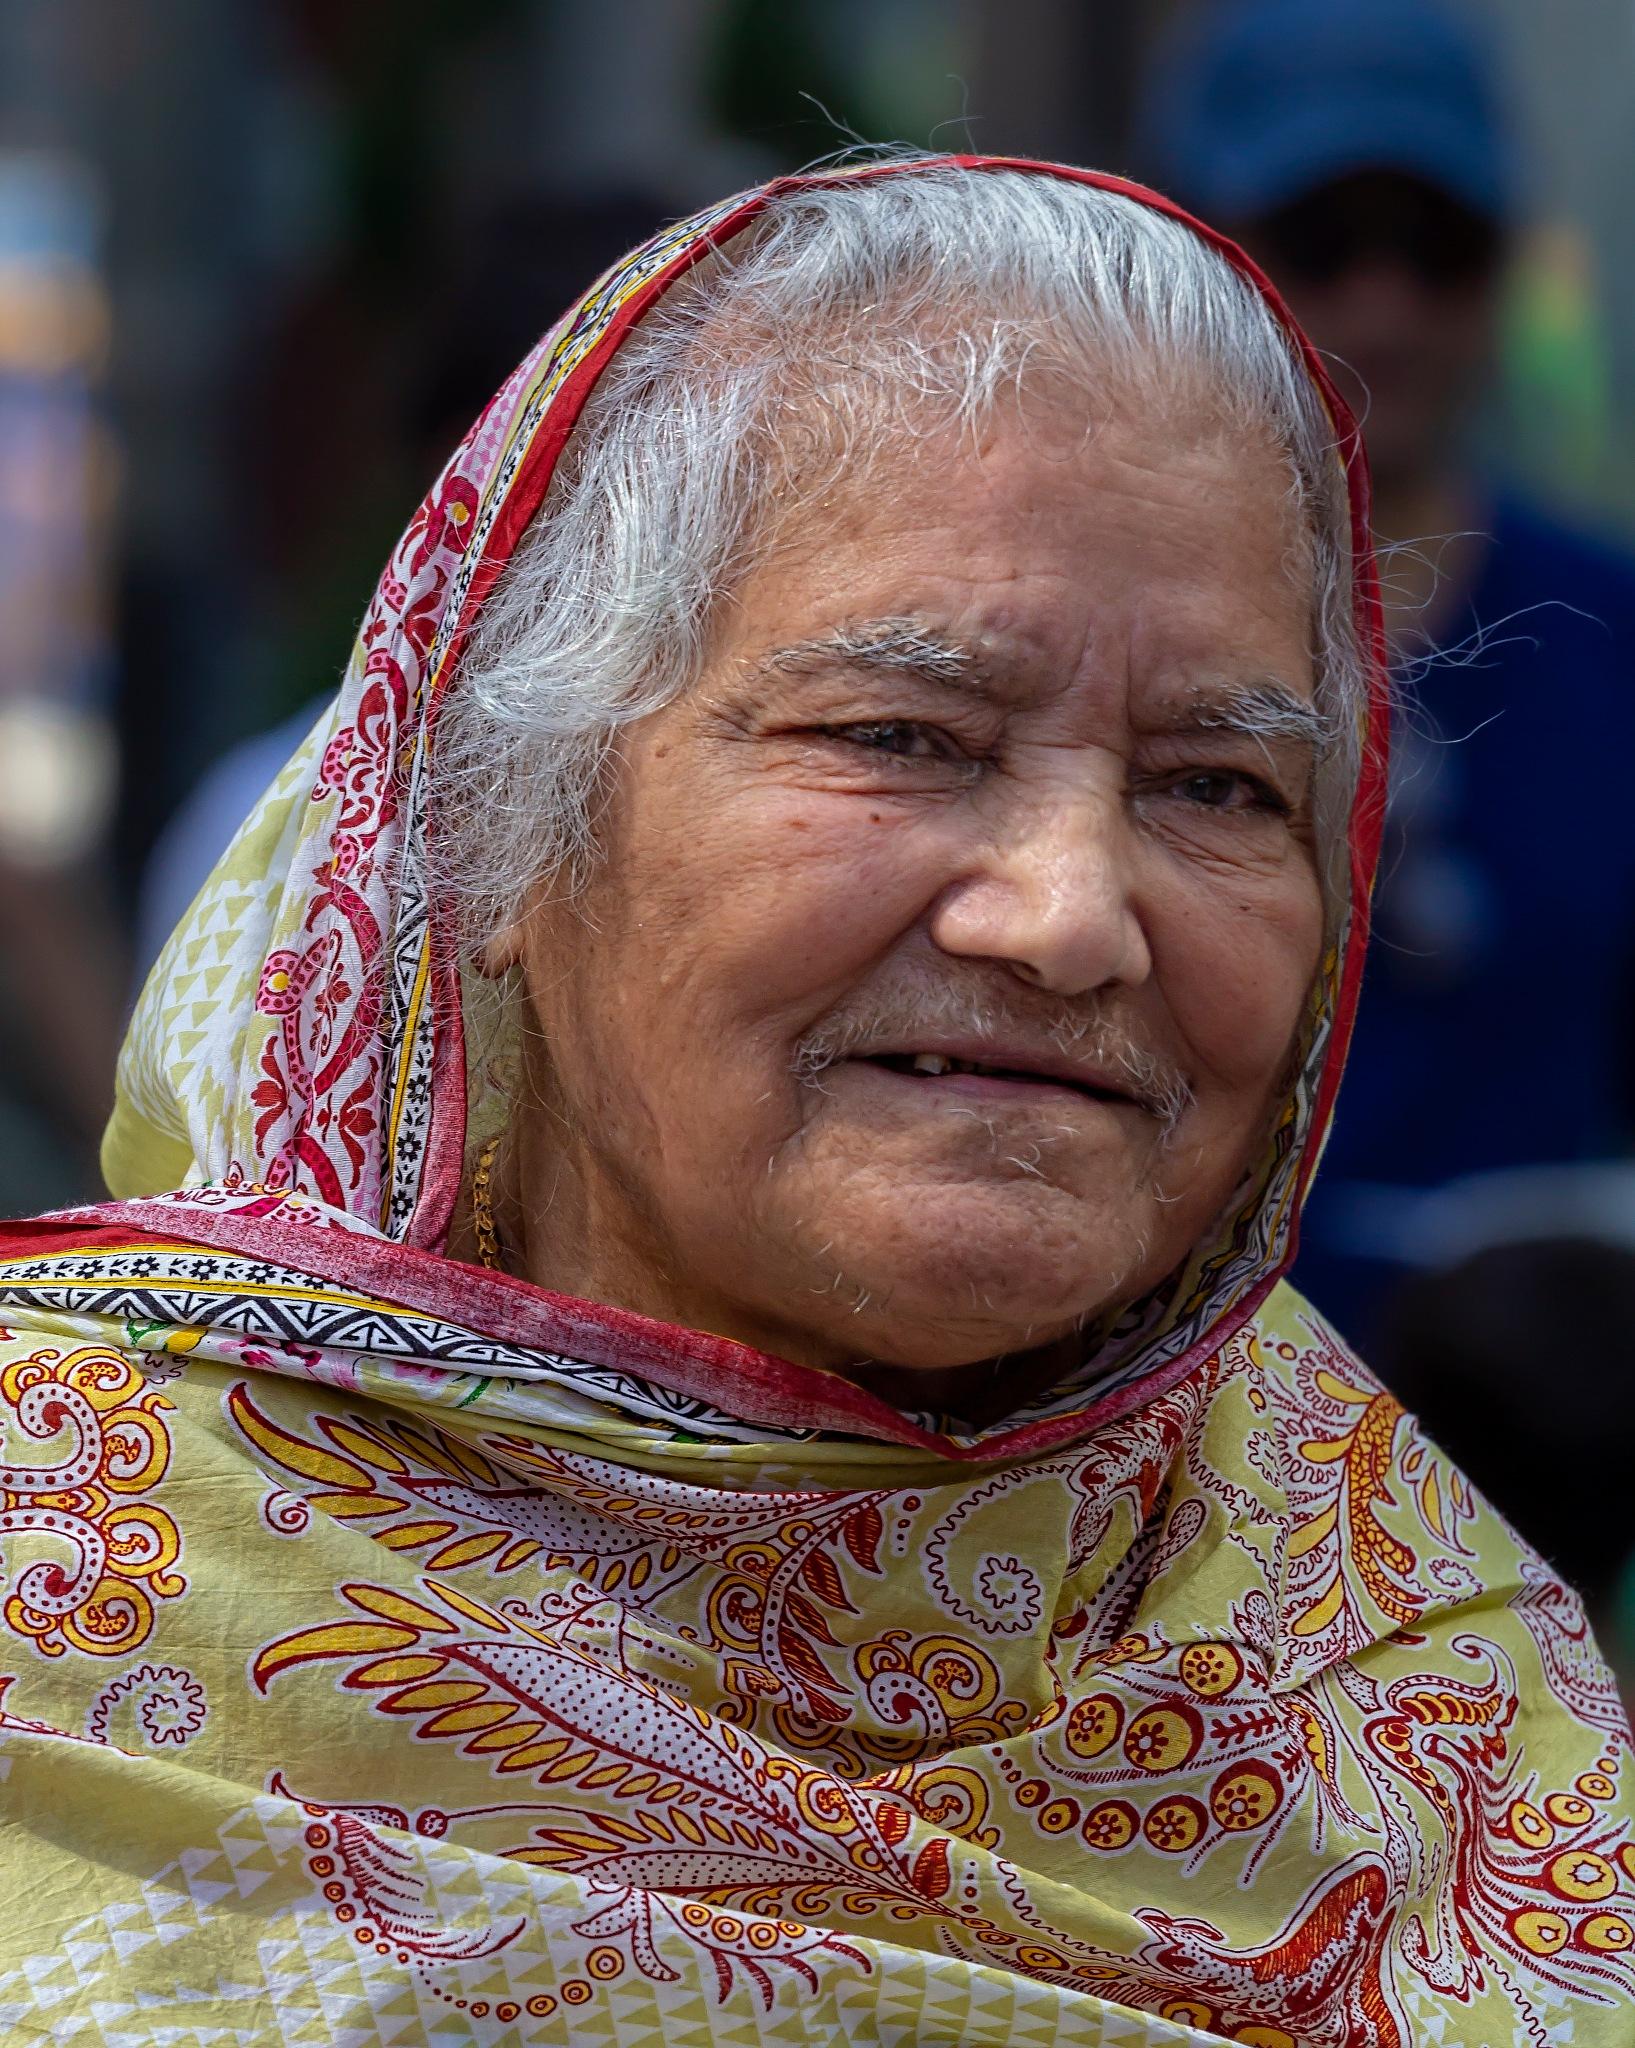 Pakistani Day NYC - Elderly Woman - Traditional Dress by robertullmann